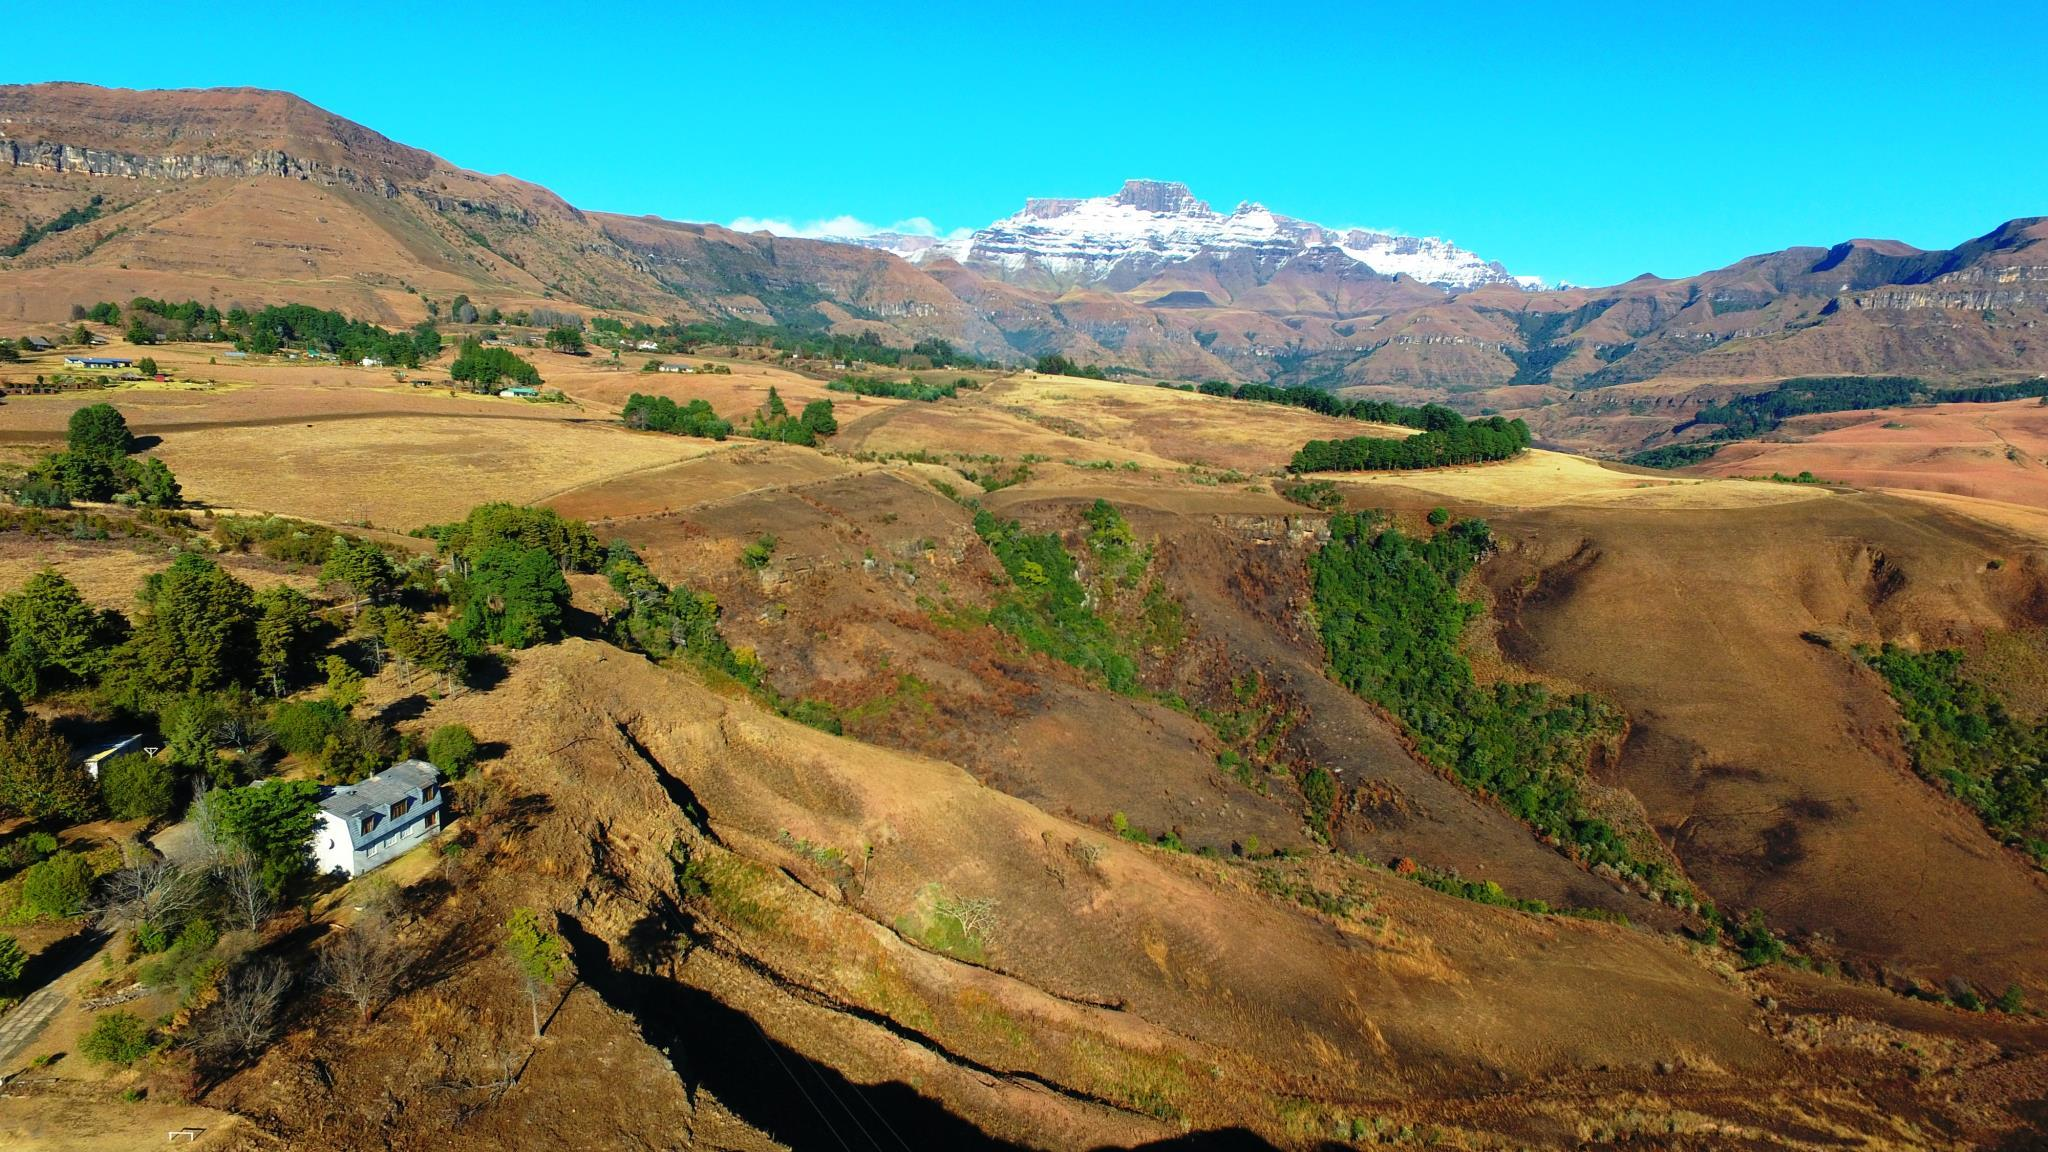 The Little Cliff Mountain Retreat